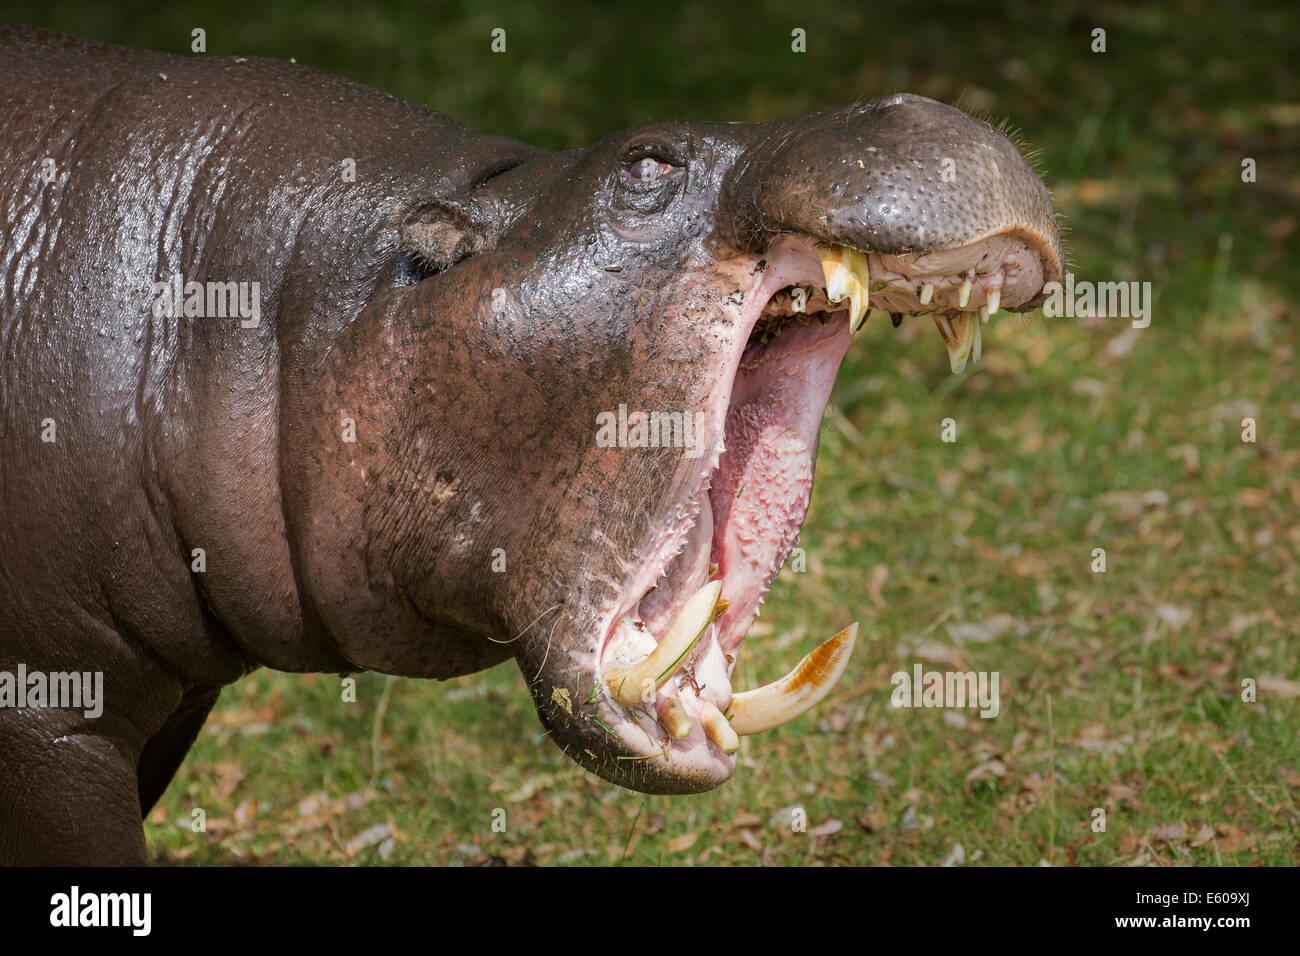 Pygmy Hippopotamus - Stock Image